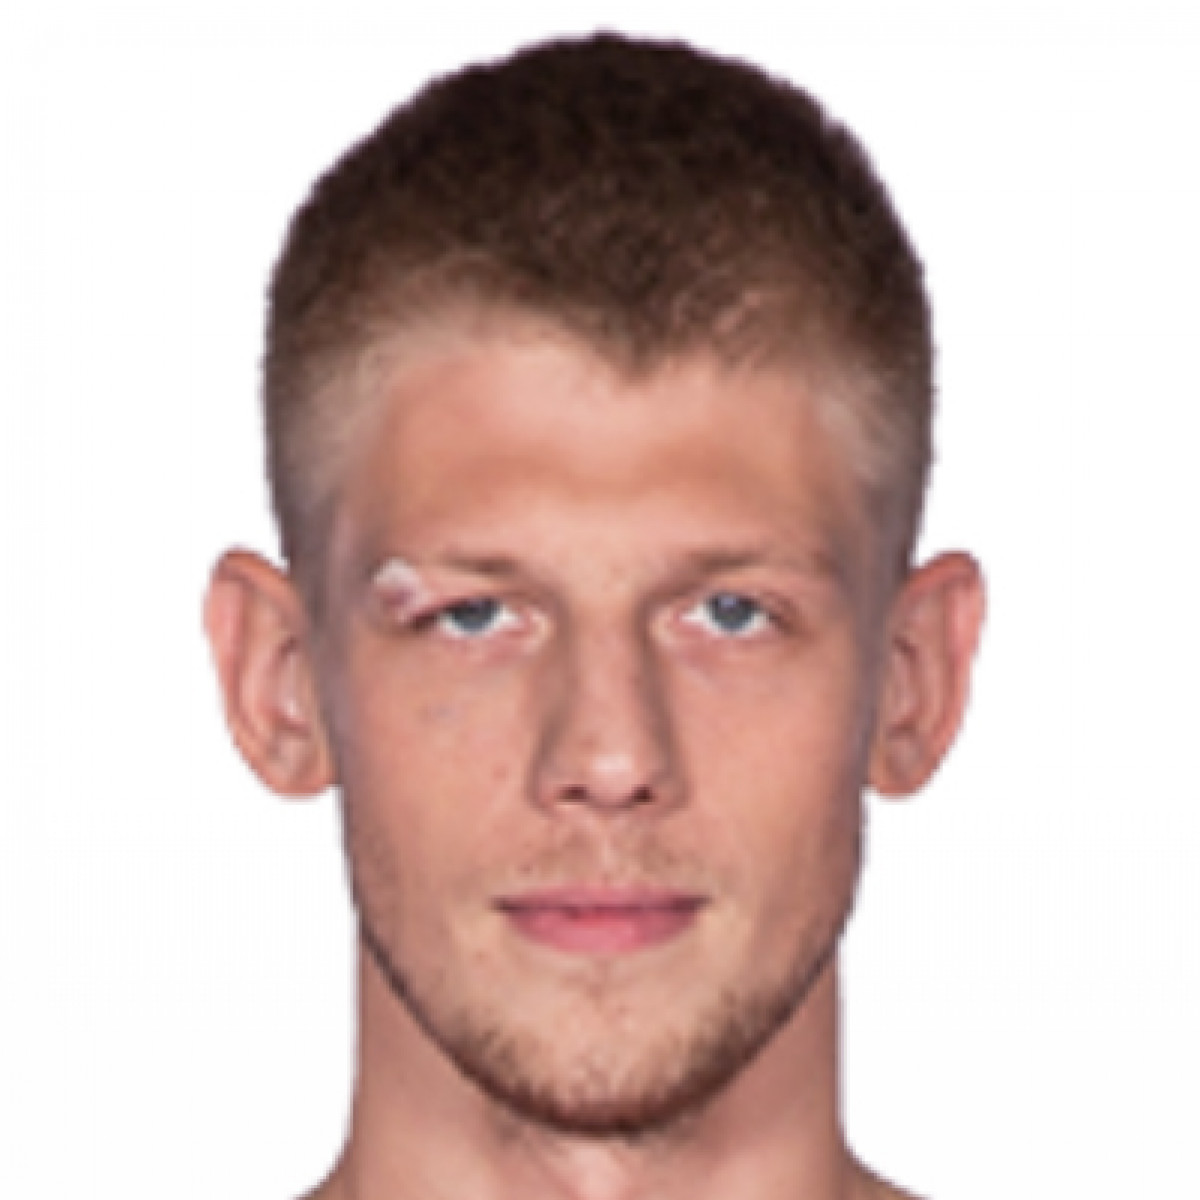 Alexandr Zakharov